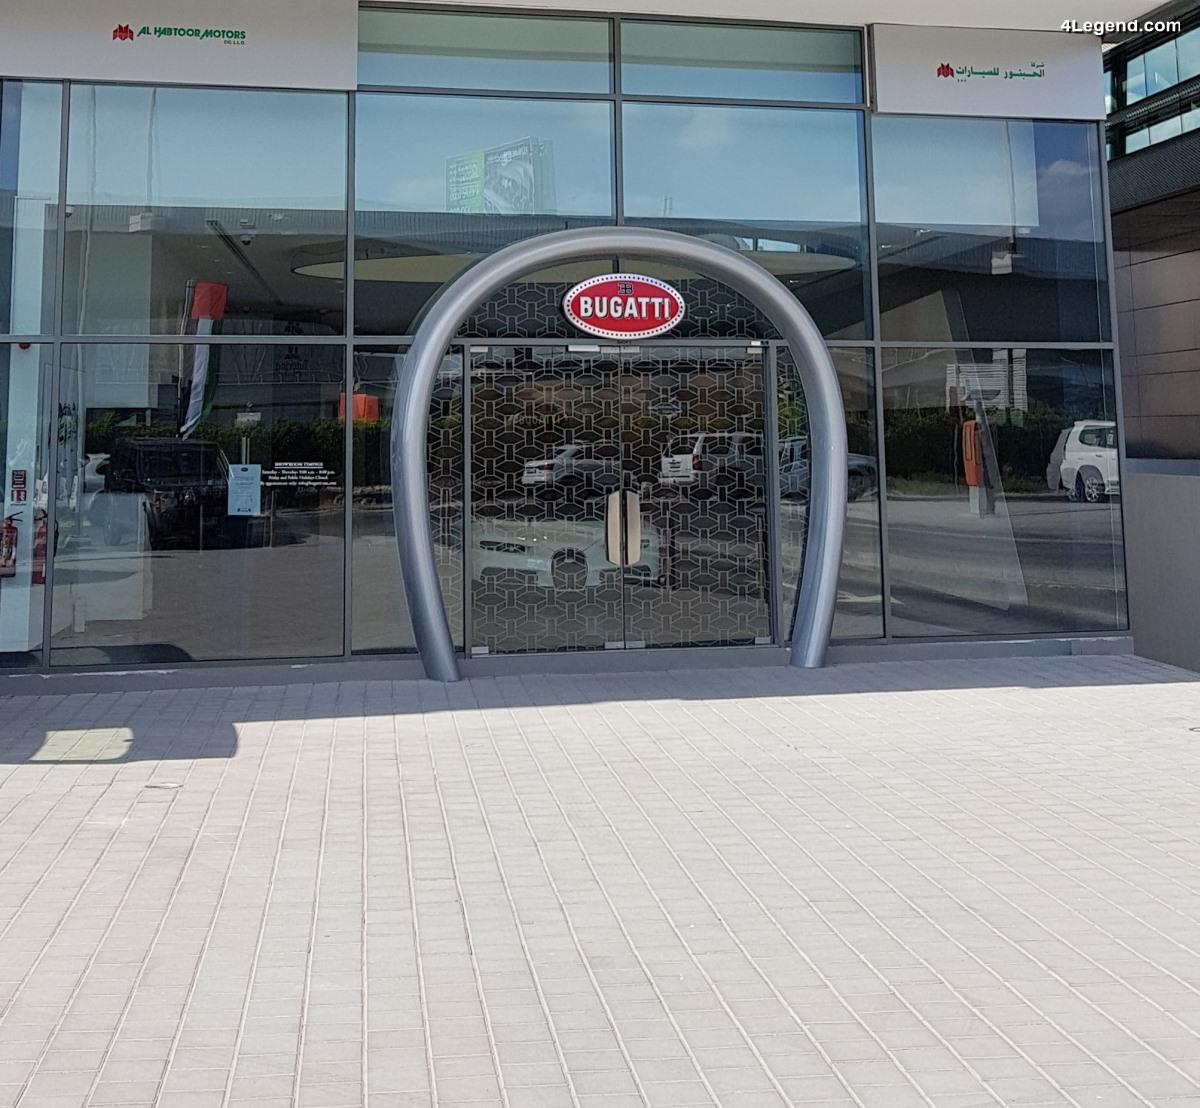 Visite du showroom Bugatti à Dubaï exposant une Bugatti Chiron unique